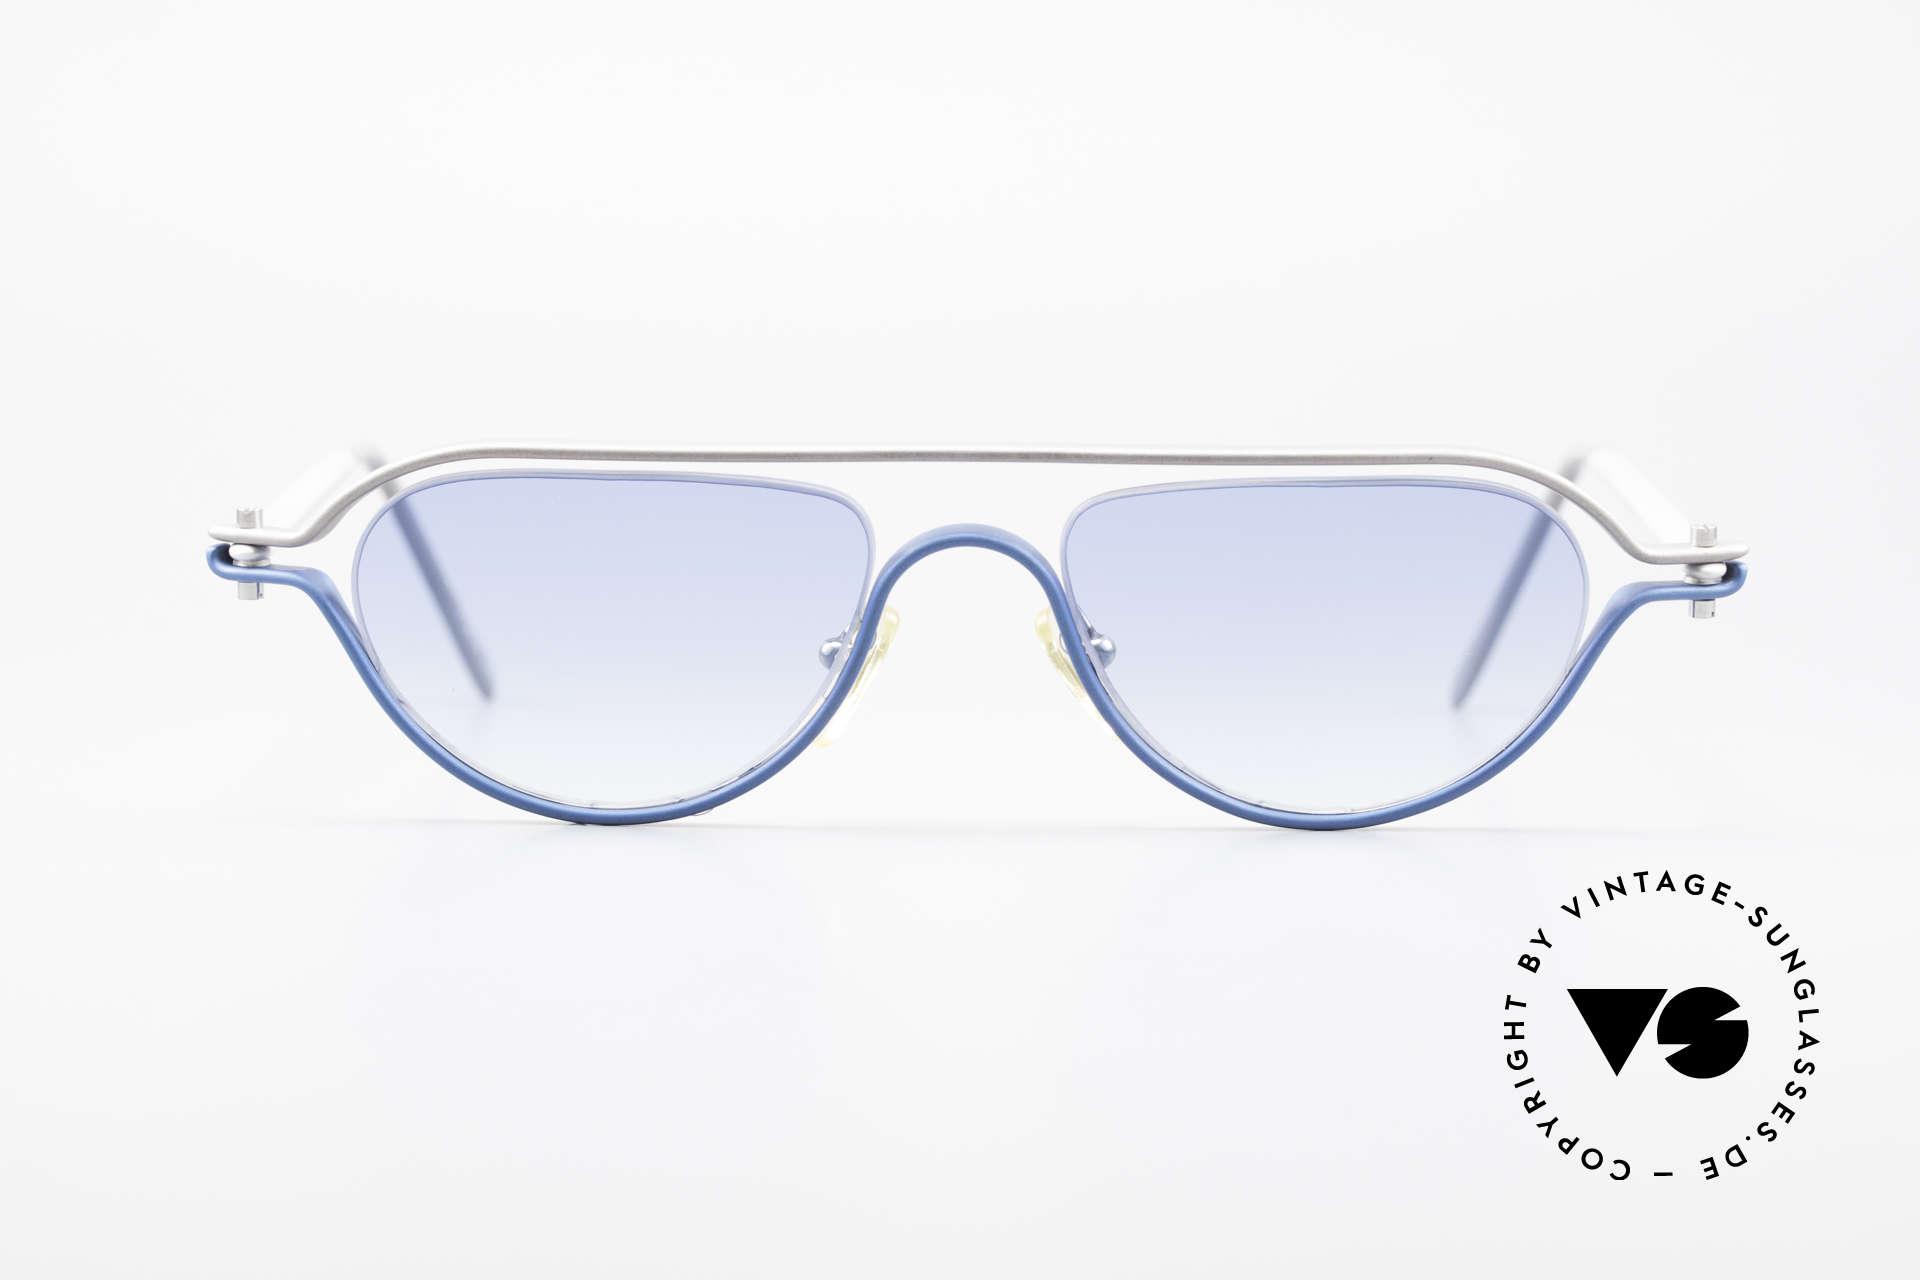 ProDesign No9 The Hunt For Red October, true vintage aluminium frame - Gail Spence Design, Made for Men and Women